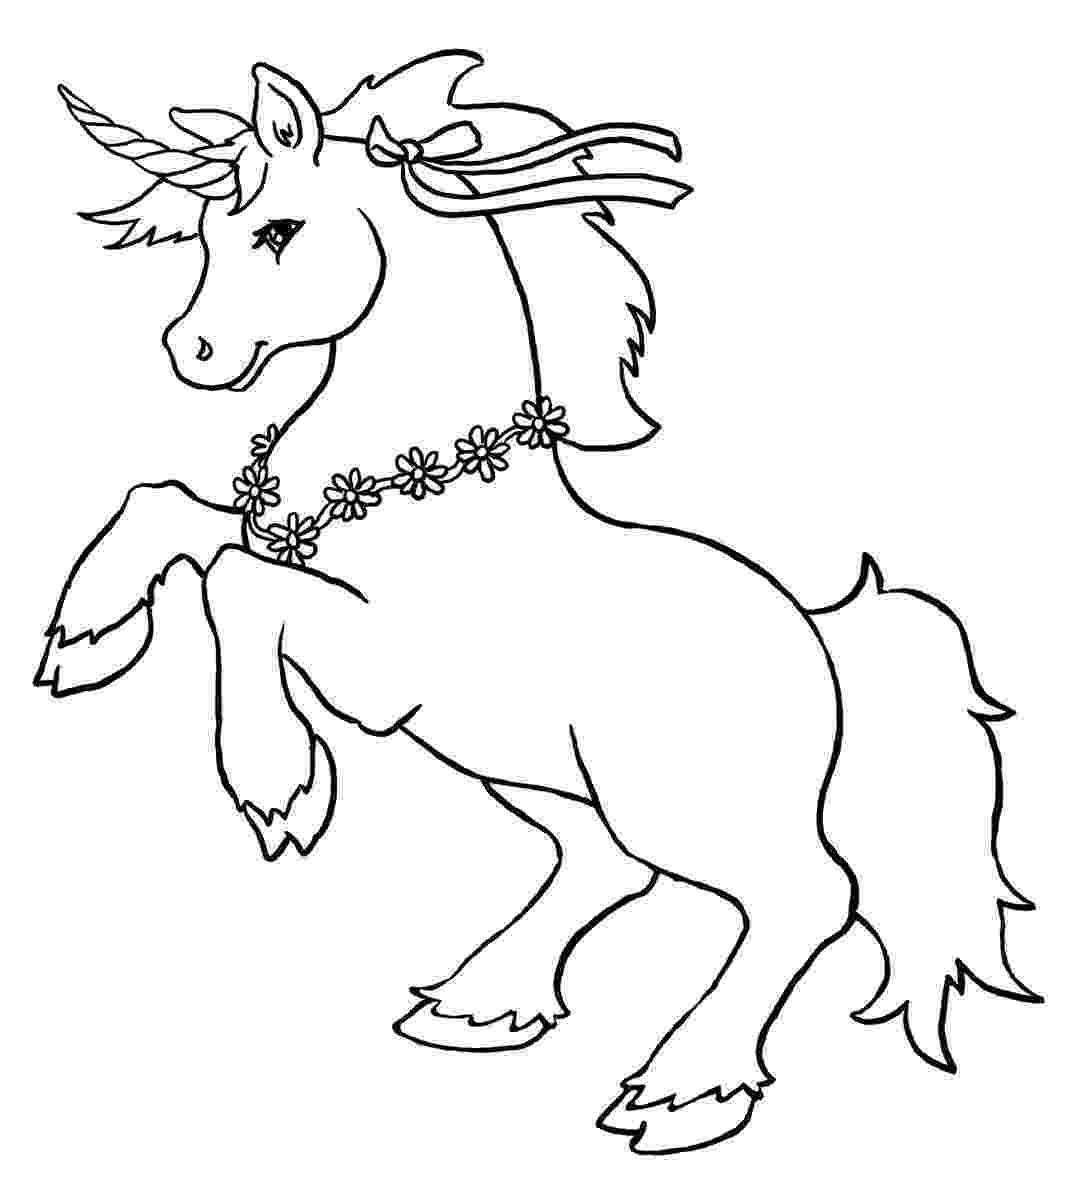 coloring page unicorn print download unicorn coloring pages for children coloring unicorn page